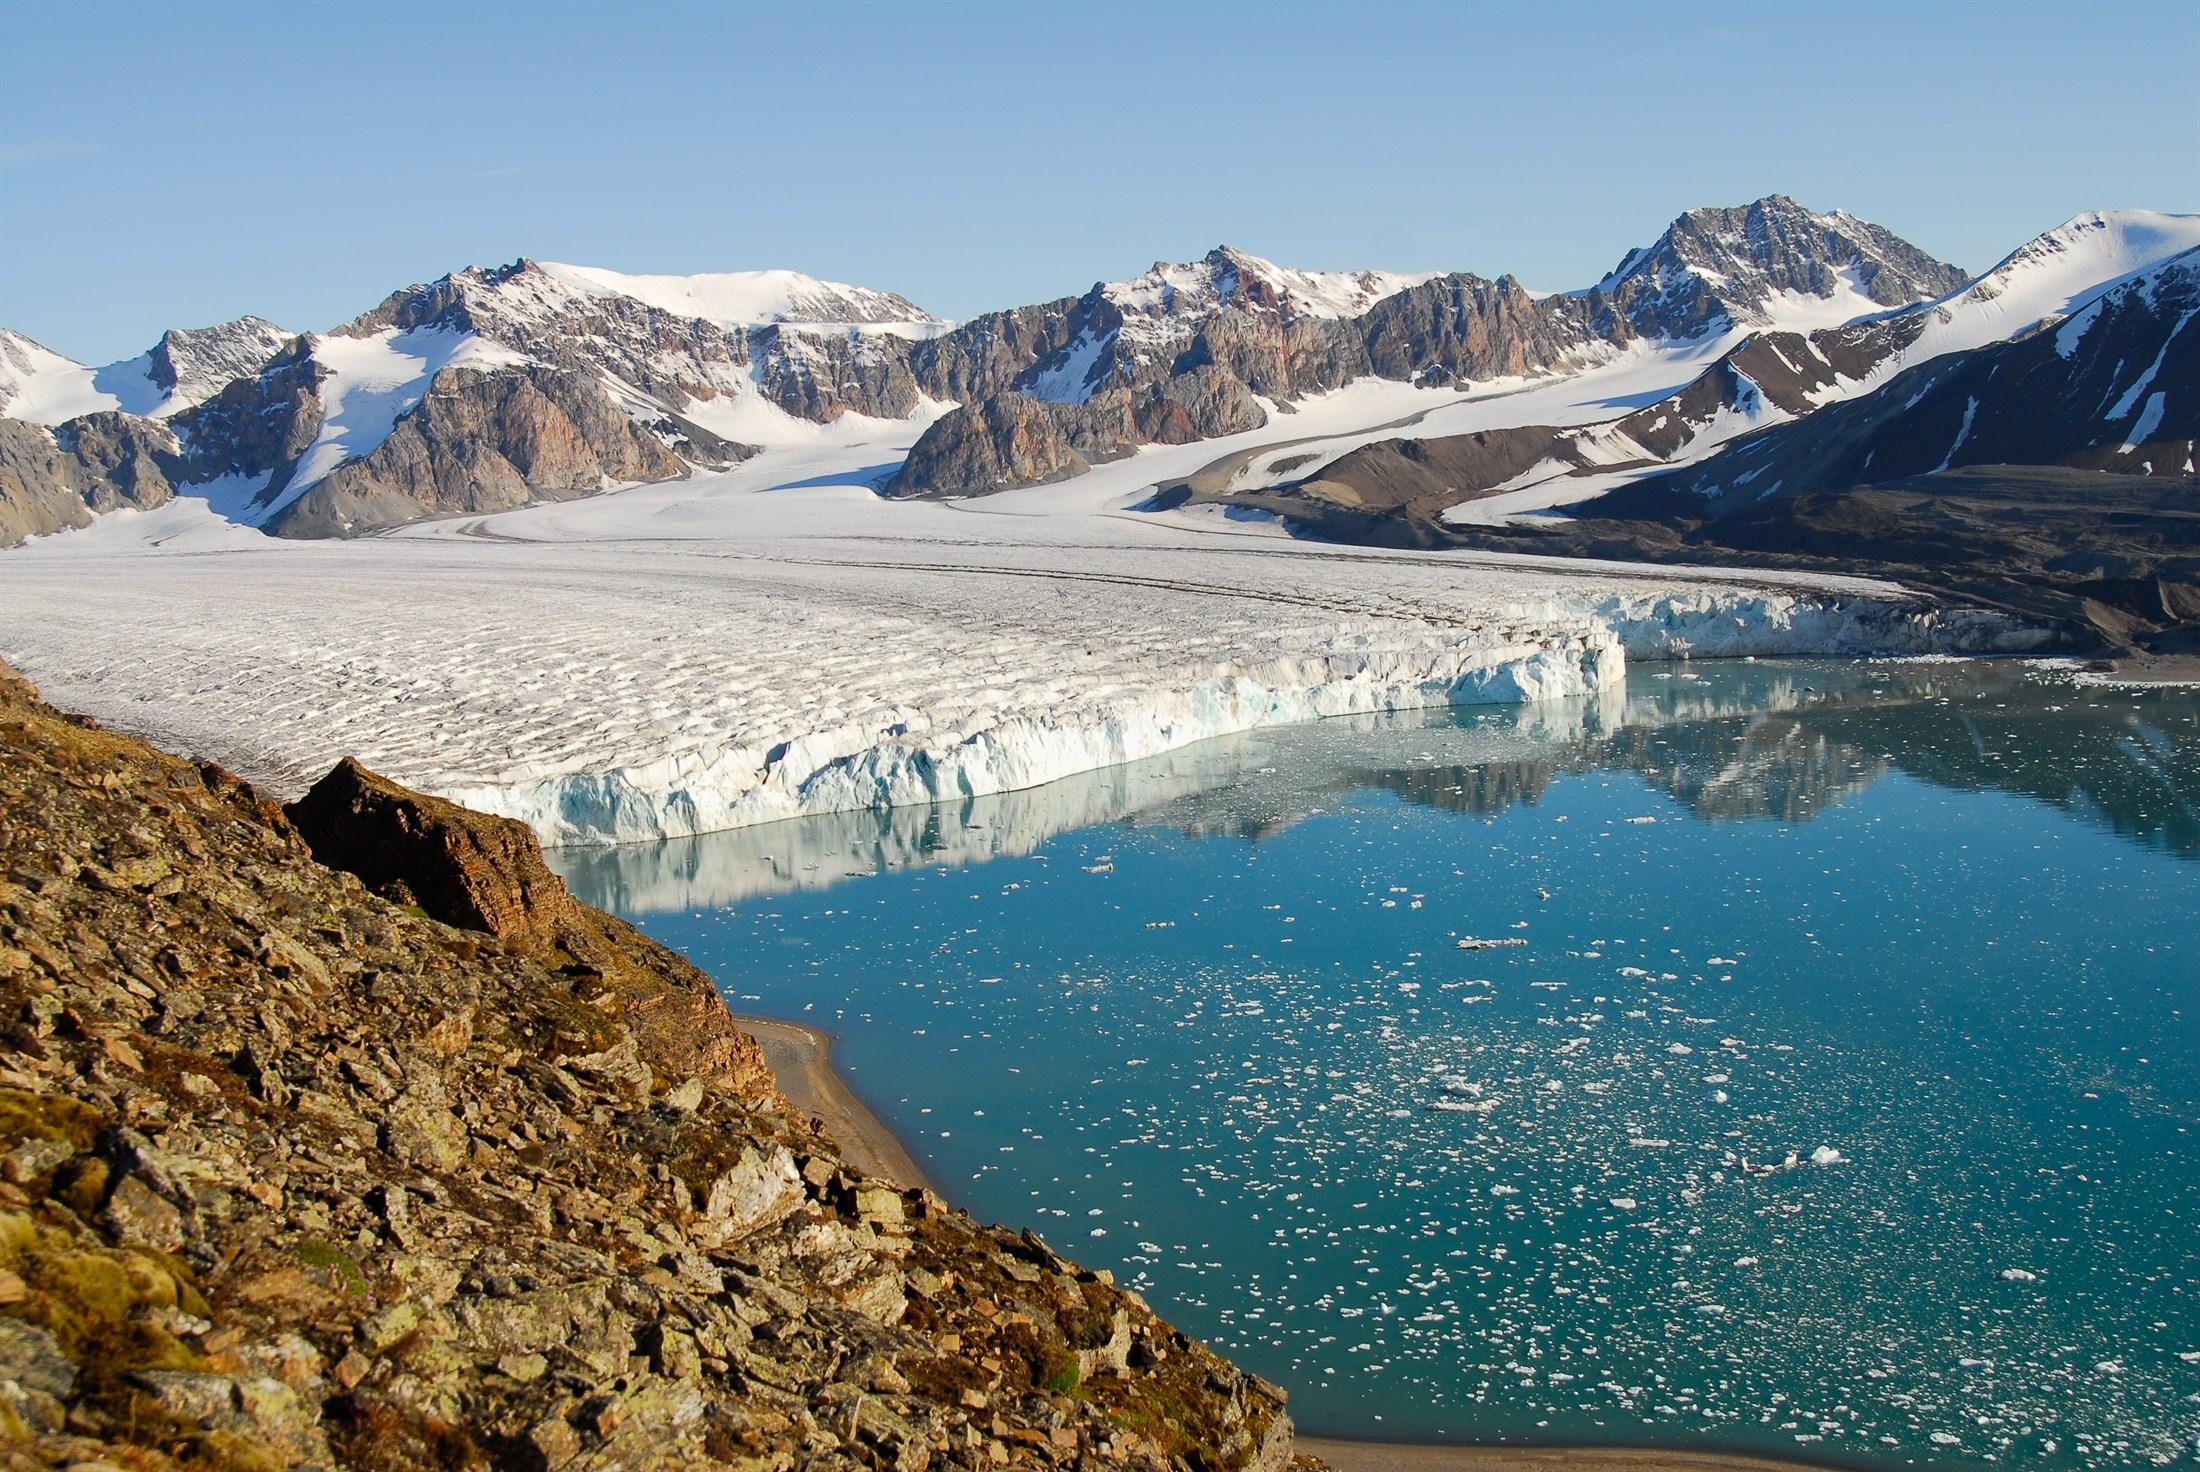 glacier-mouth-krossfjorden-svalbard_e178-2200x1472px